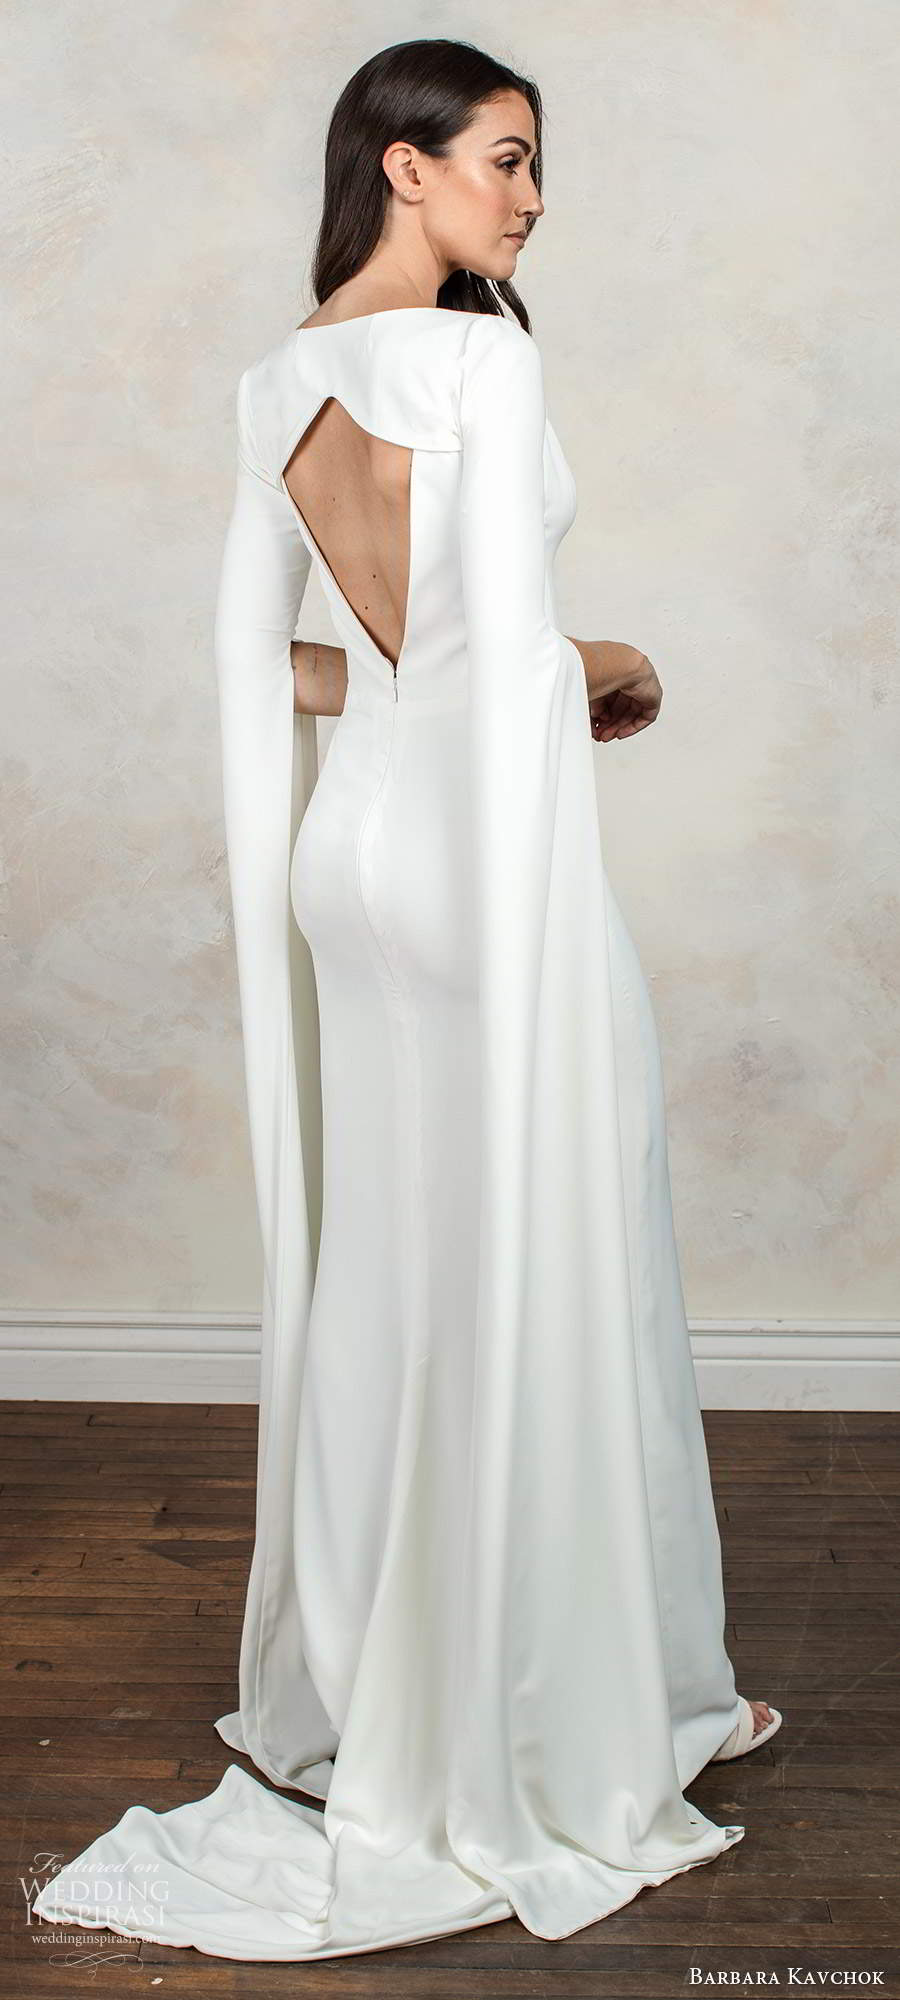 barbara kavchok fall 2020 bridal sleeveless v neckline clean minimally embellished sheath wedding dress keyhole back chapel train long sleeve capelet (3) bv